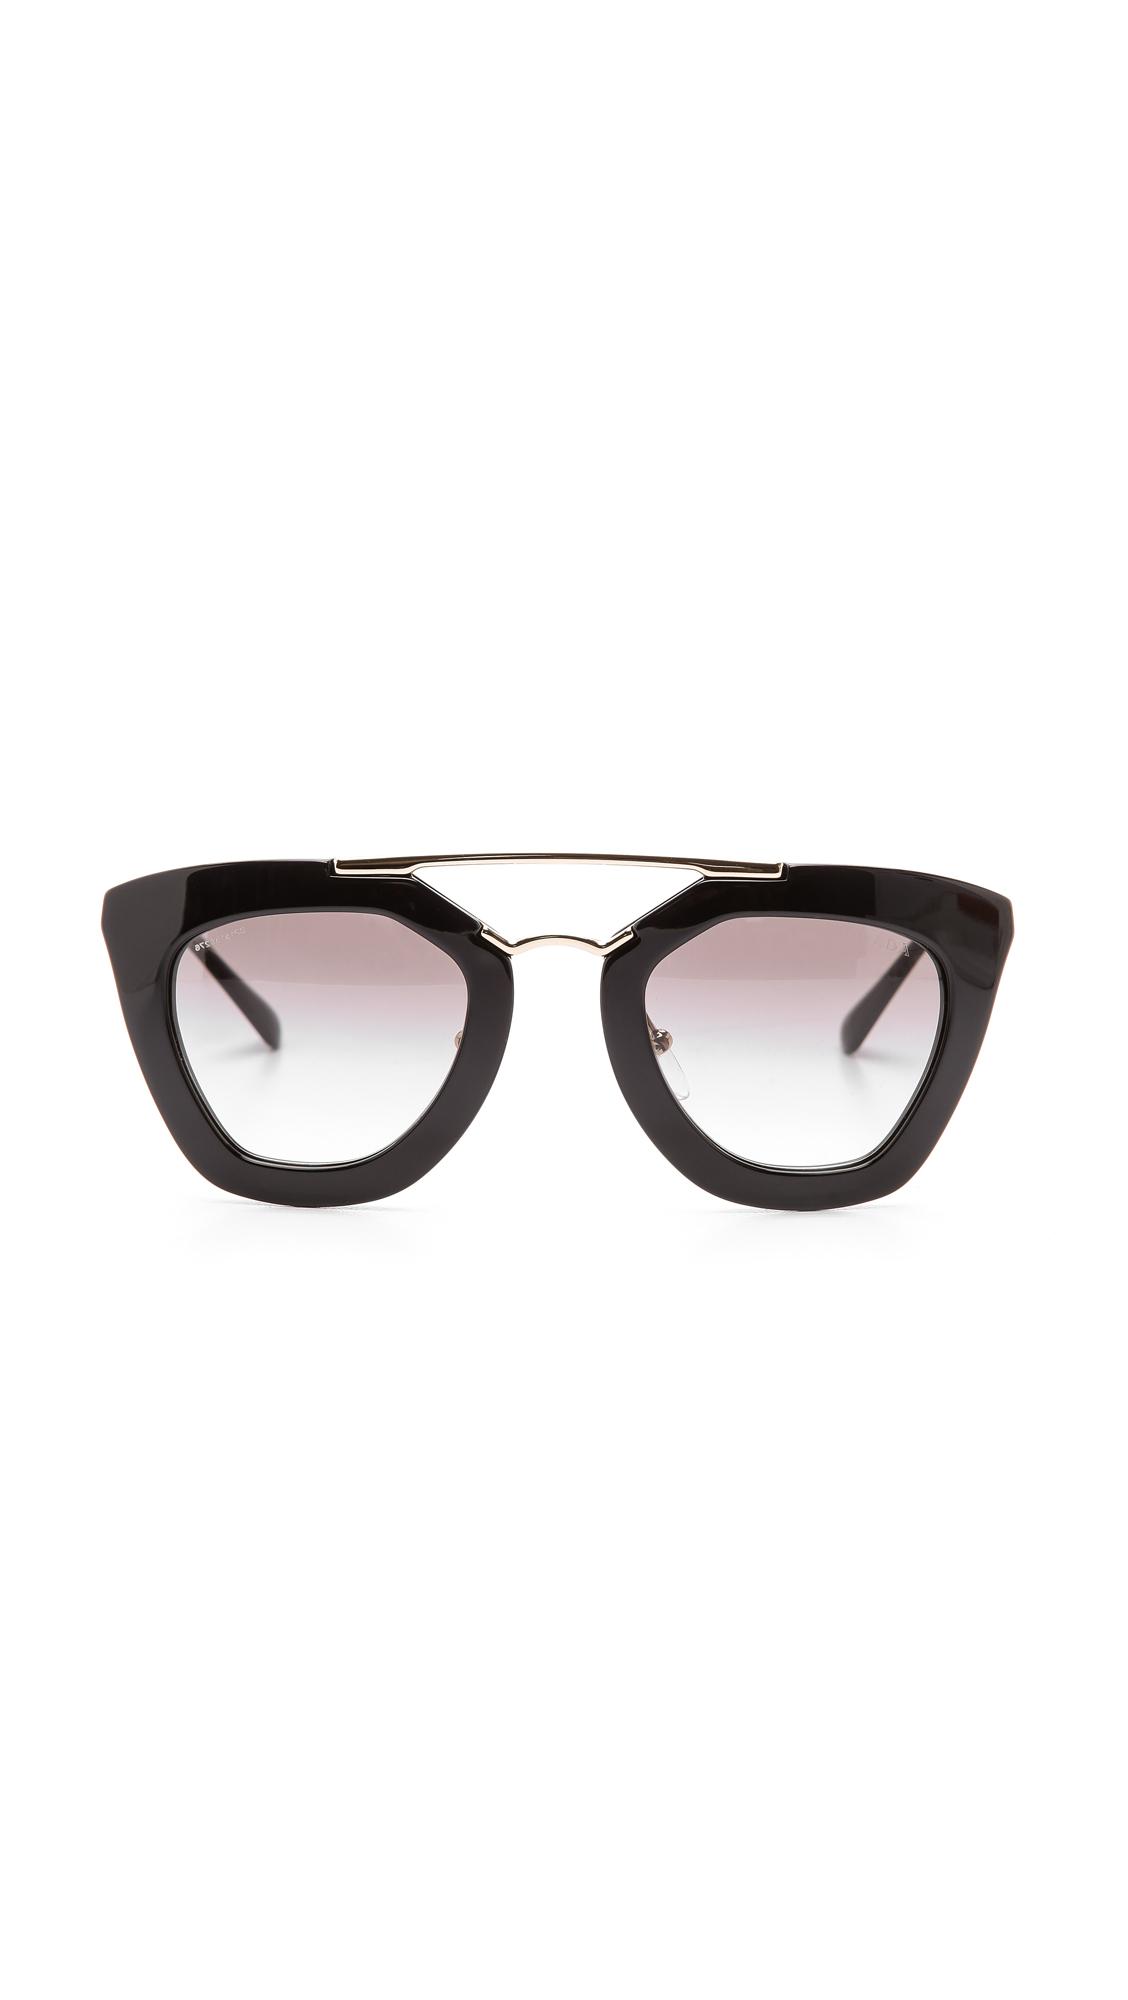 Prada Thick Frame Sunglasses in Black Lyst